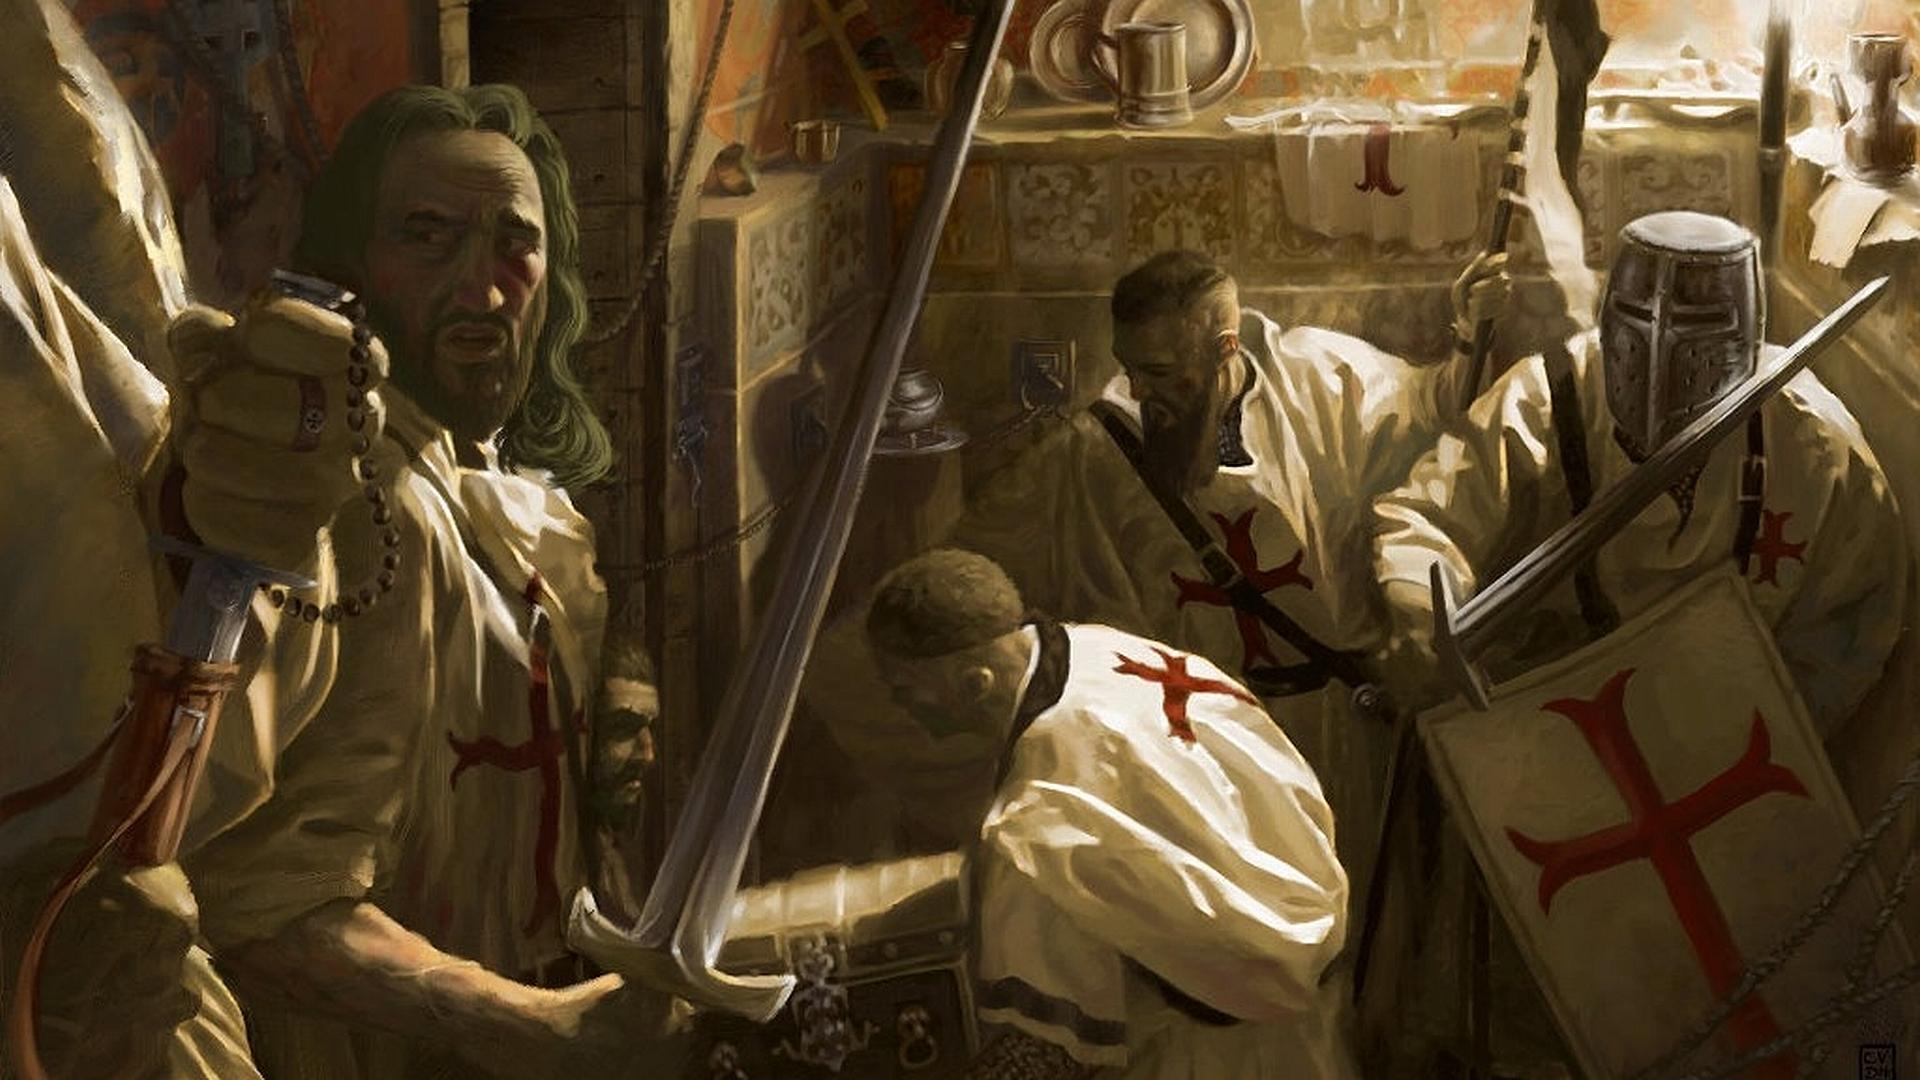 Knights Templar Wallpaper Iphone Knight Hd Wallpaper Background Image 1920x1080 Id